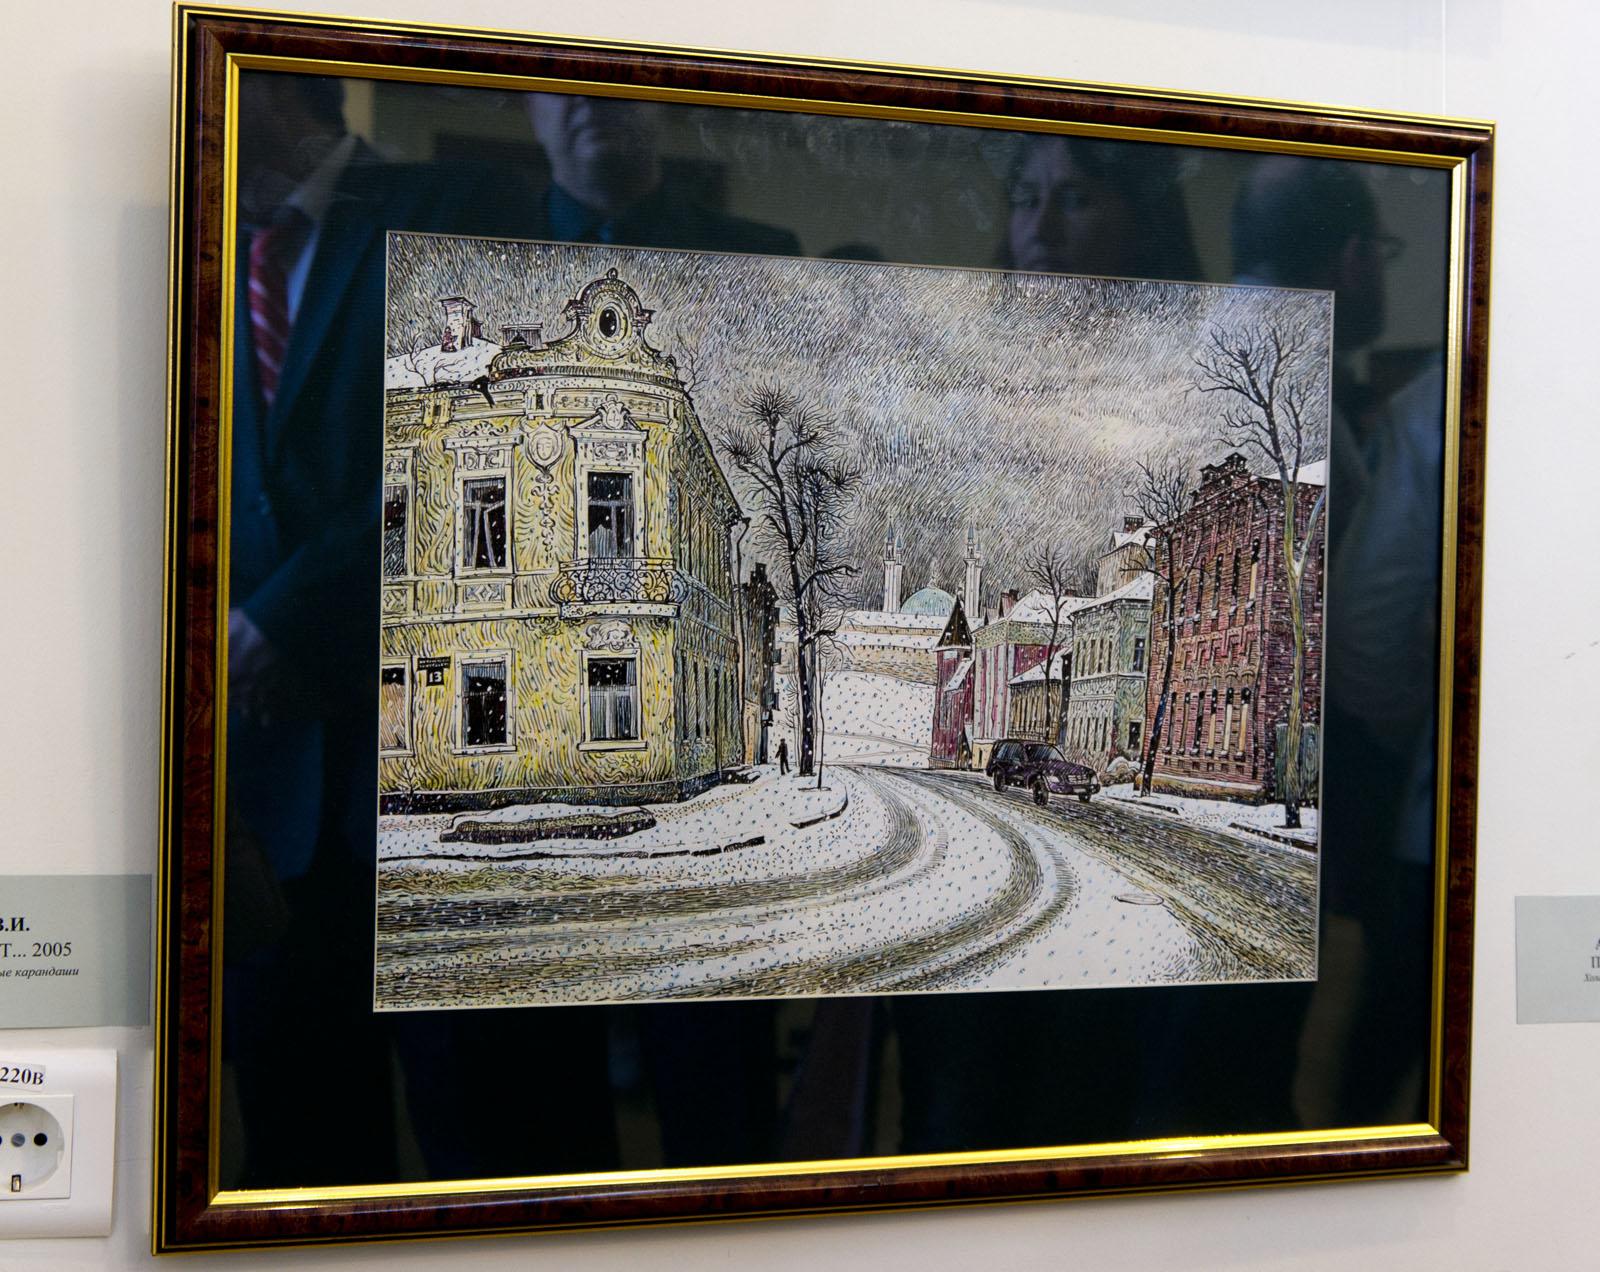 Фото №78538. А снег идет.... 2005. Ильин В.И.